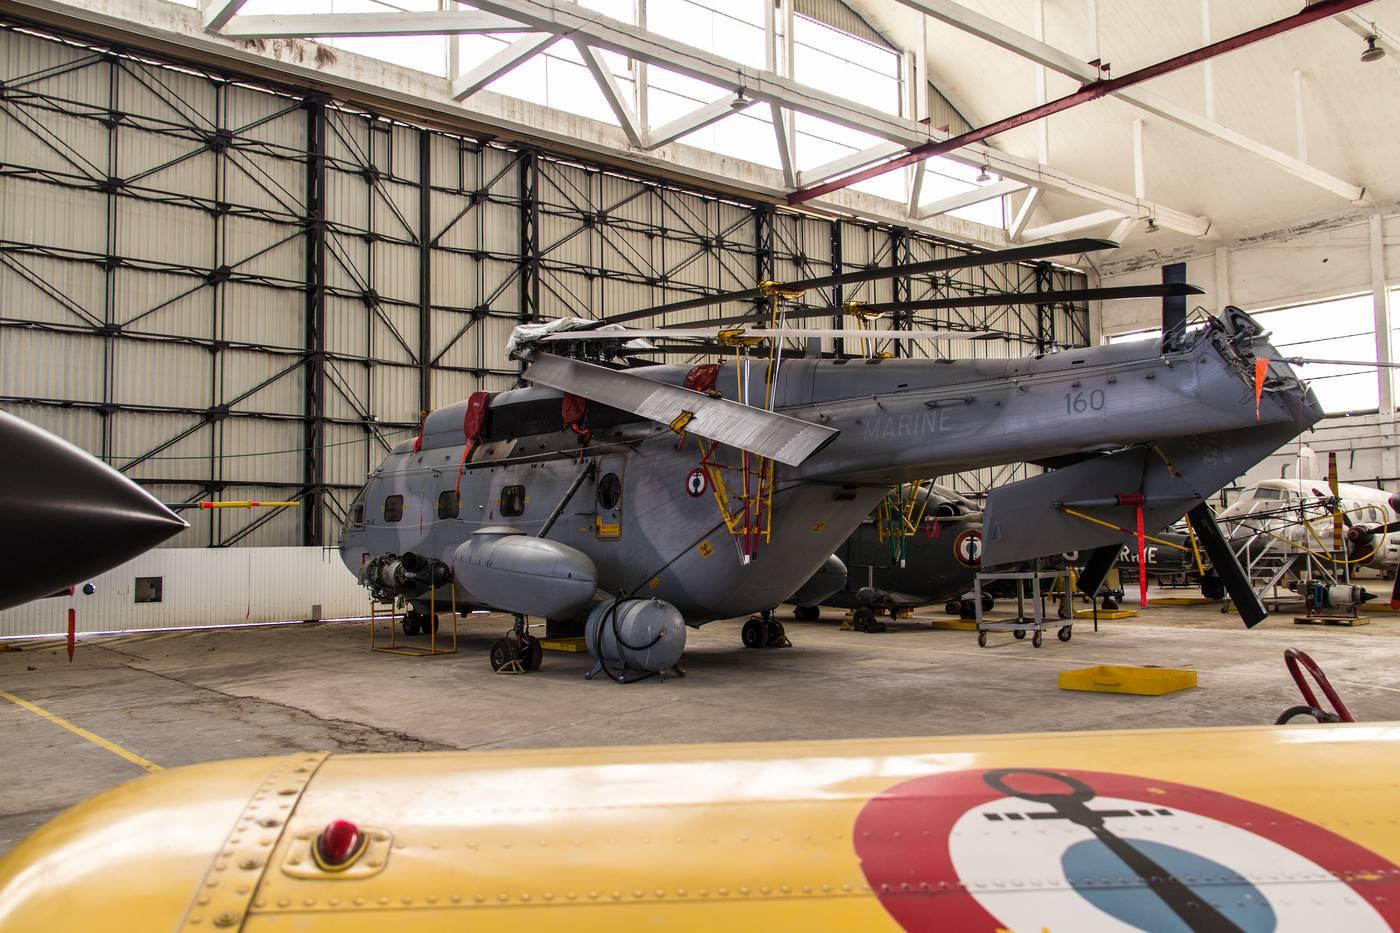 Naam: rochefort-ocean-rochefort-musee-aeronautique-navale2.jpg Bekeken: 359 Grootte: 193,1 KB